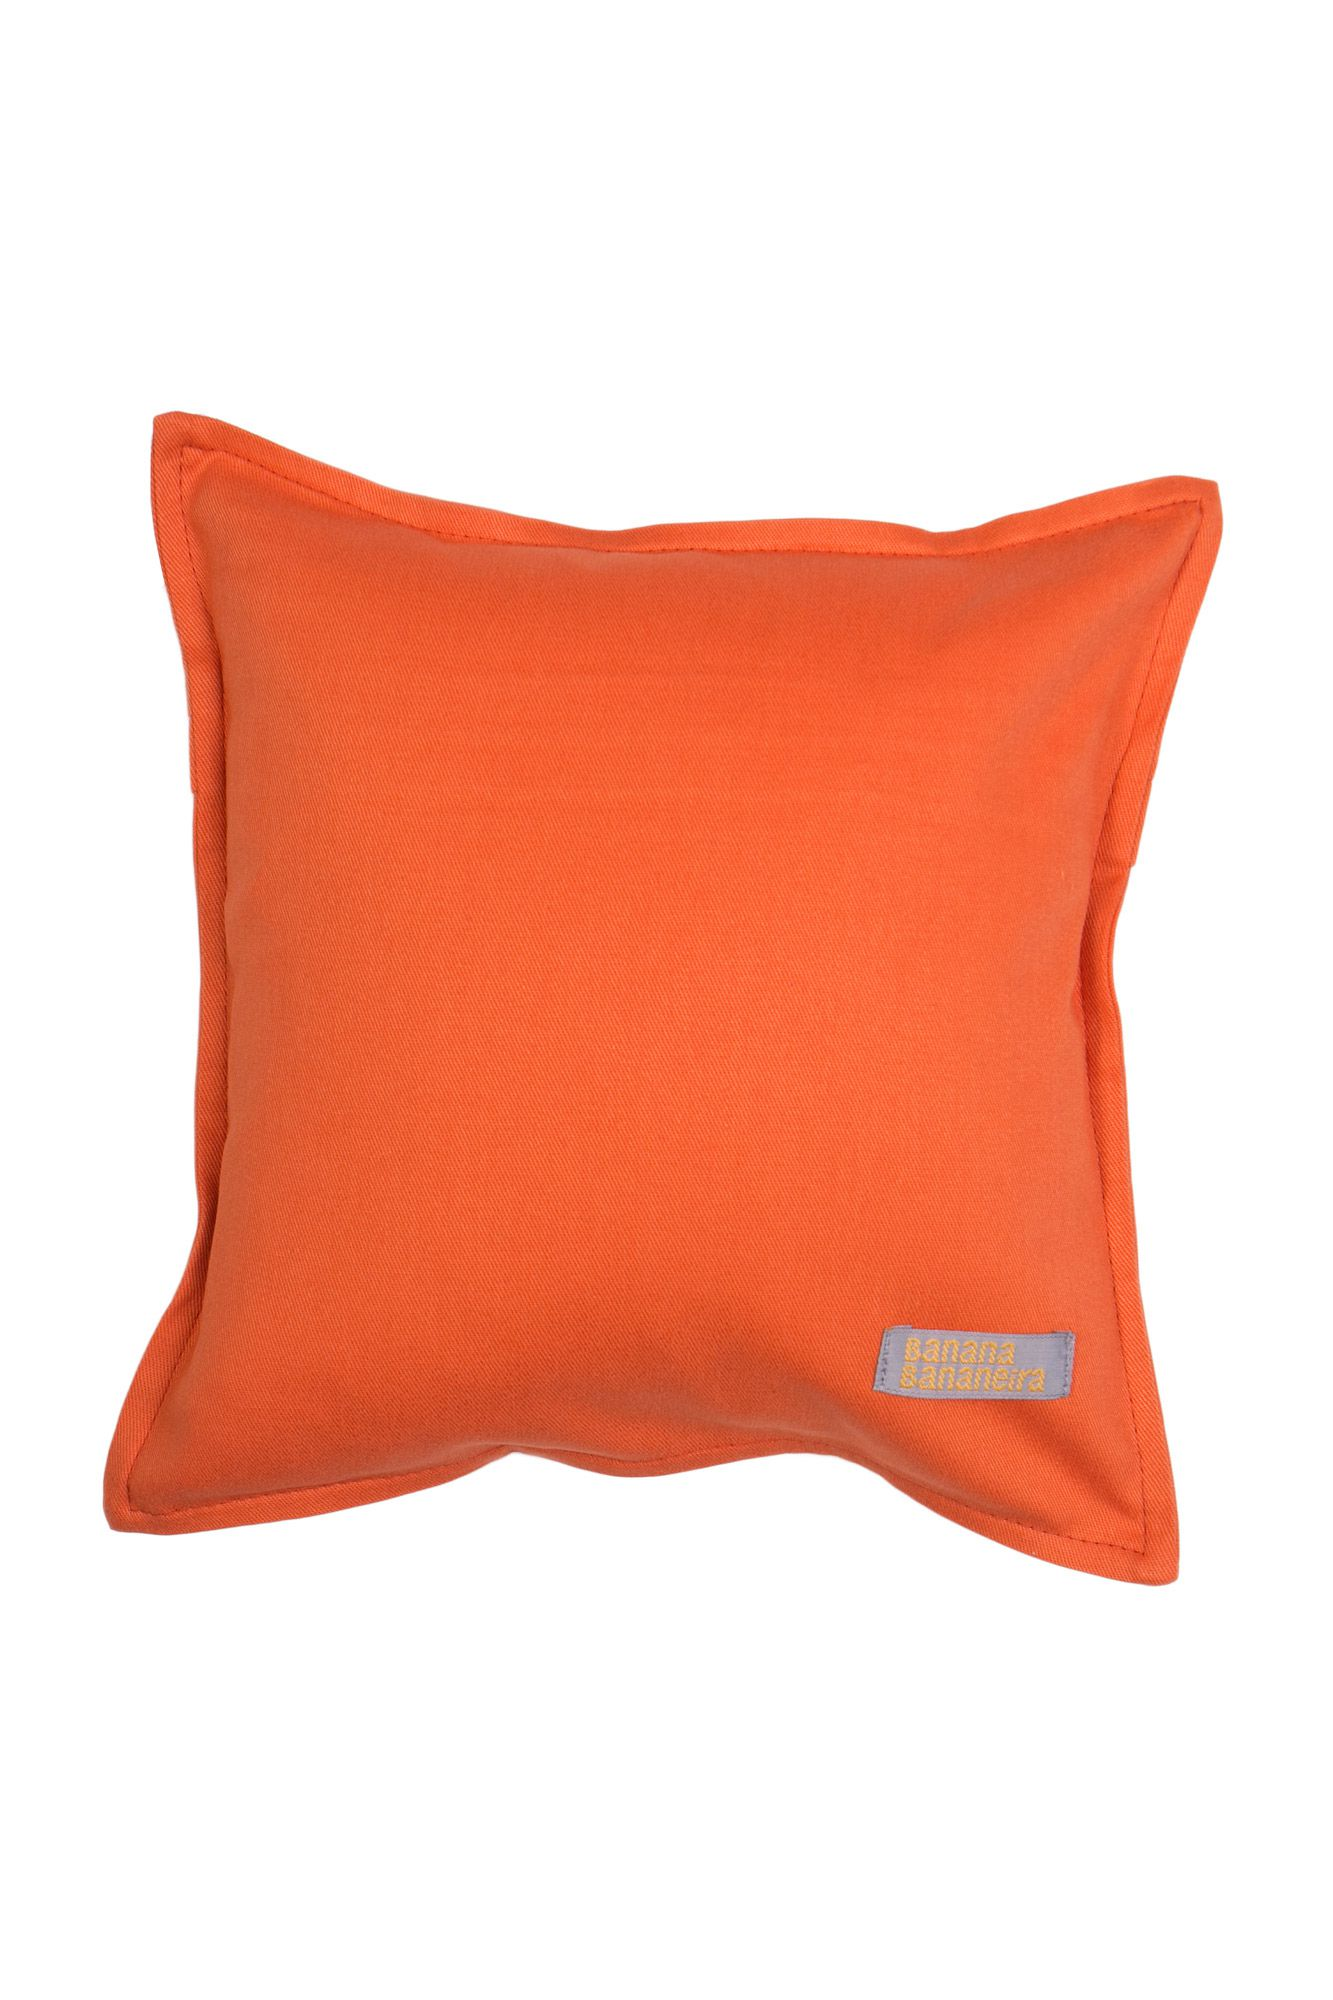 Almofada em pesponto 25 cm x 25 cm laranja